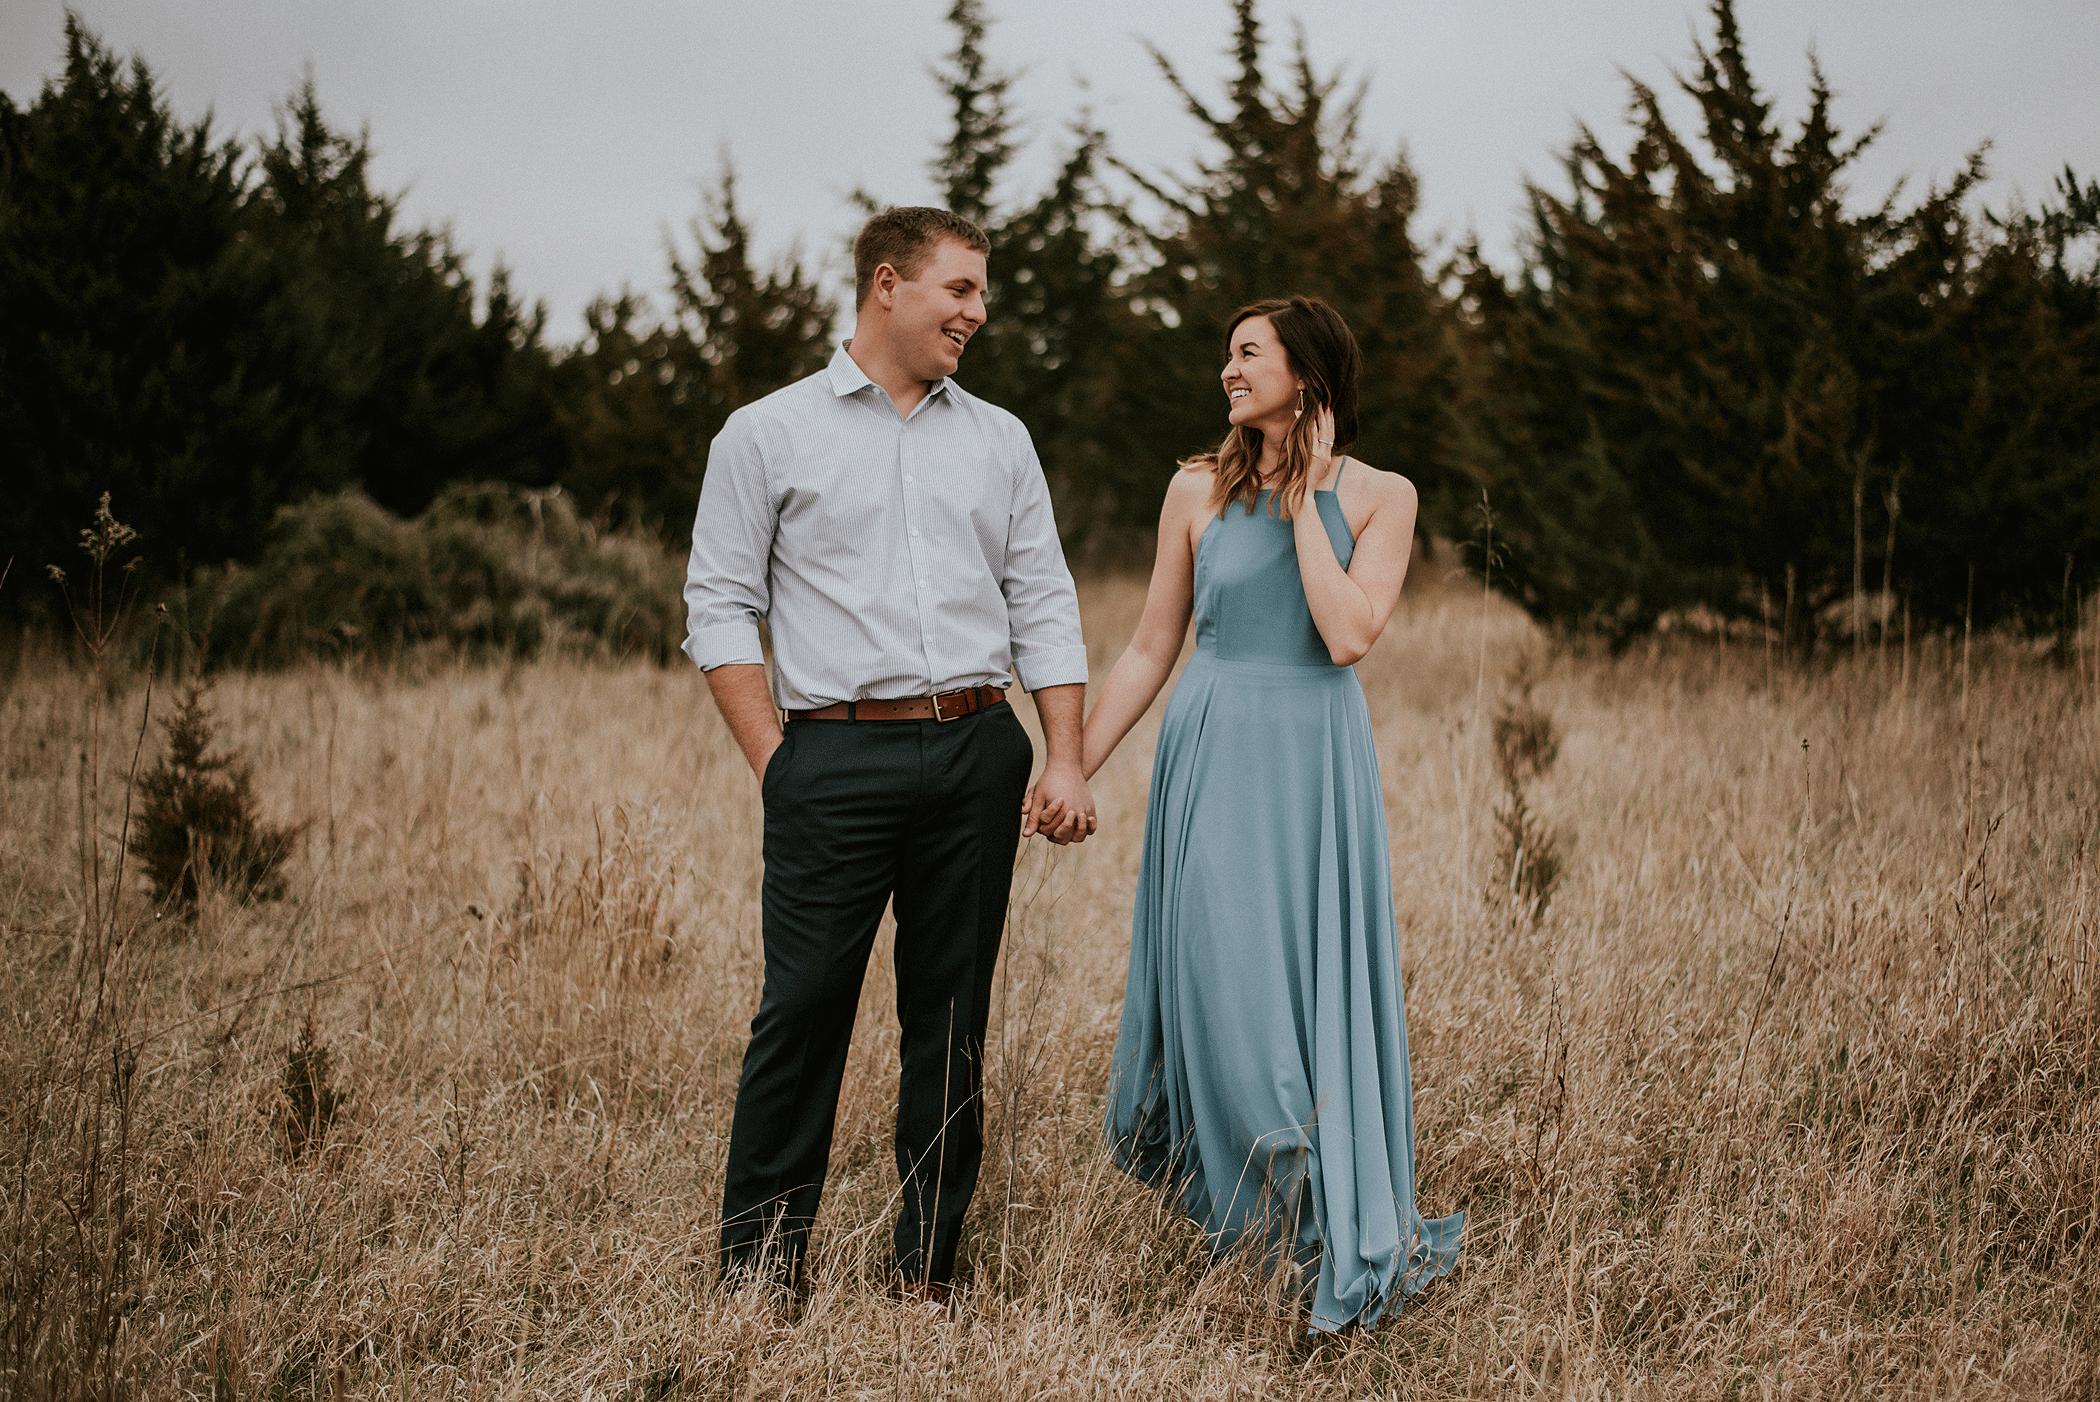 kaylie-sirek-nebraska-wedding-engagement-photographer-photography-grand-island-kearney-hastings-lincoln-14.png